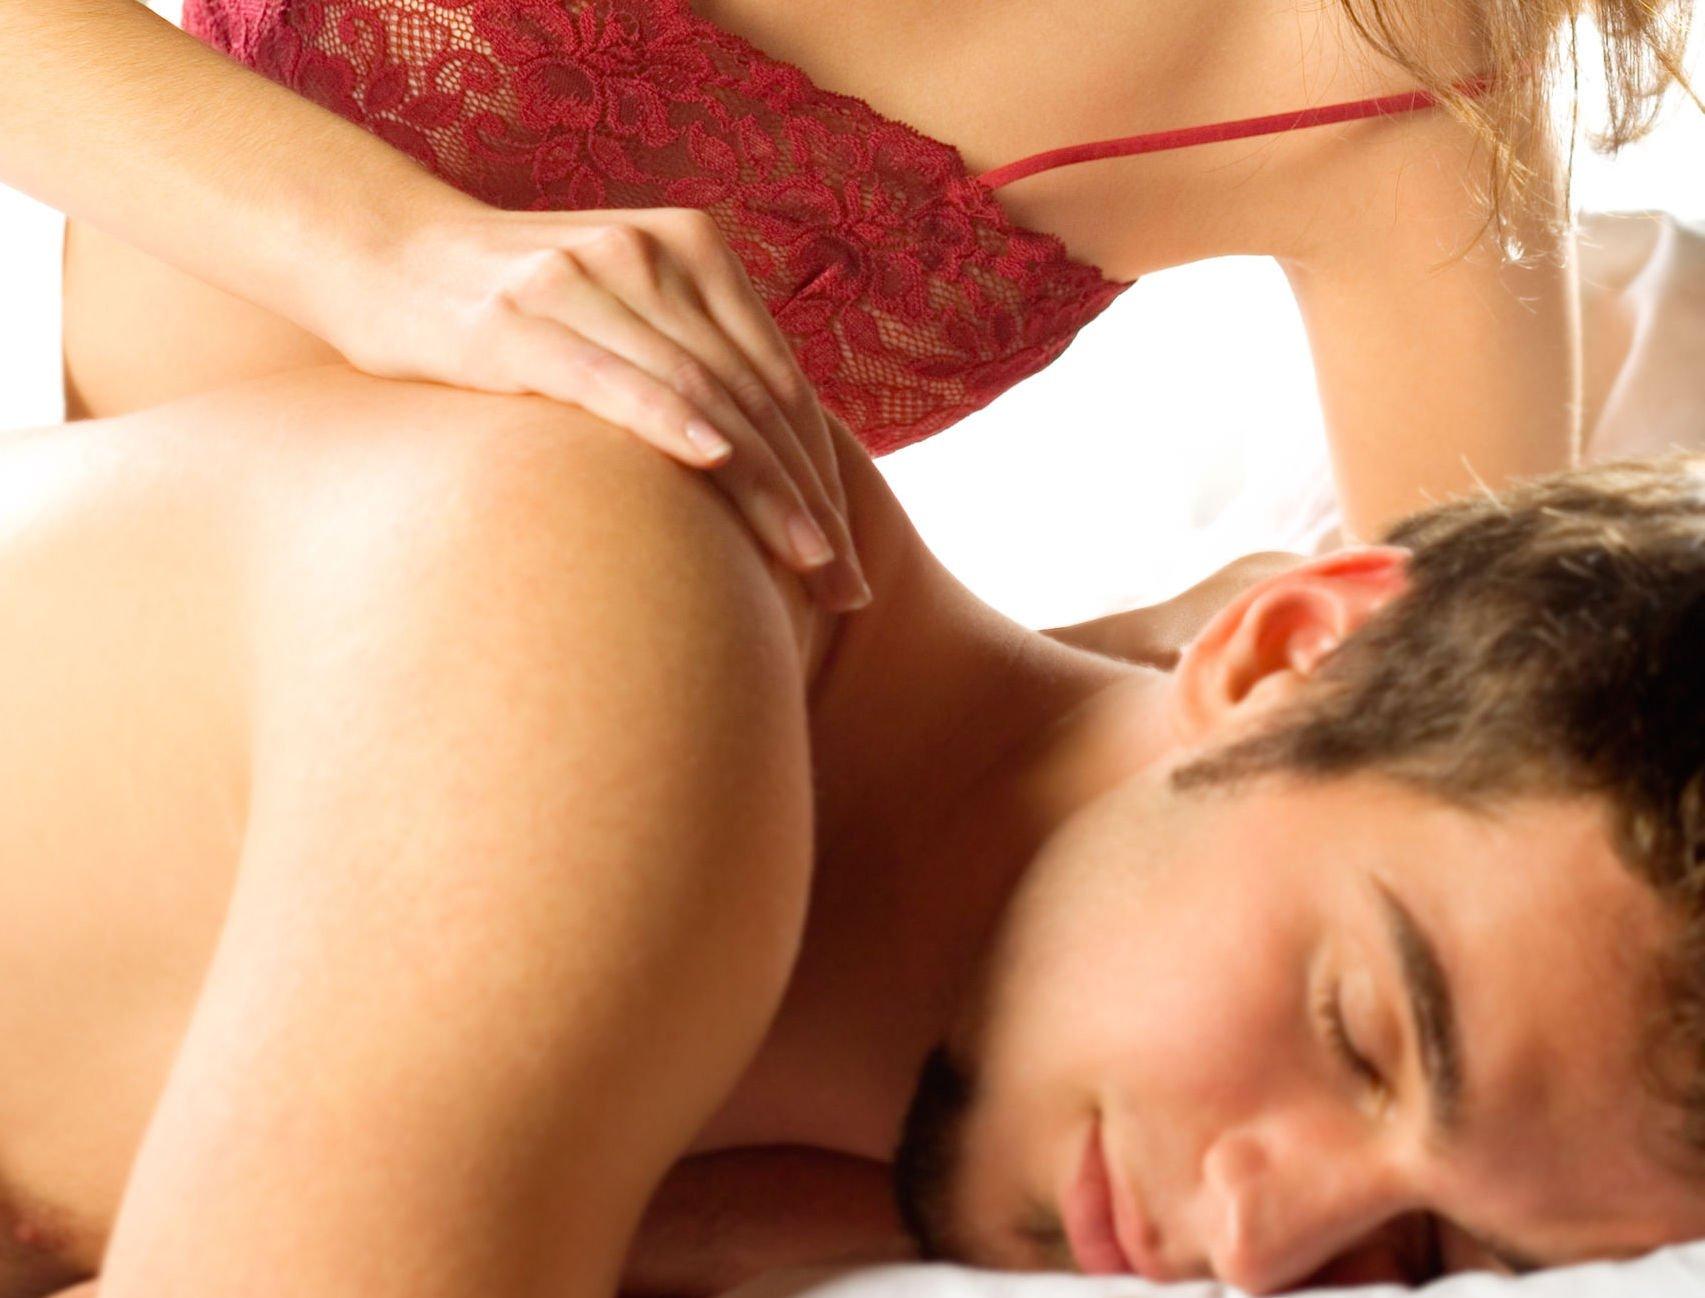 eroticke videa erotické masáže